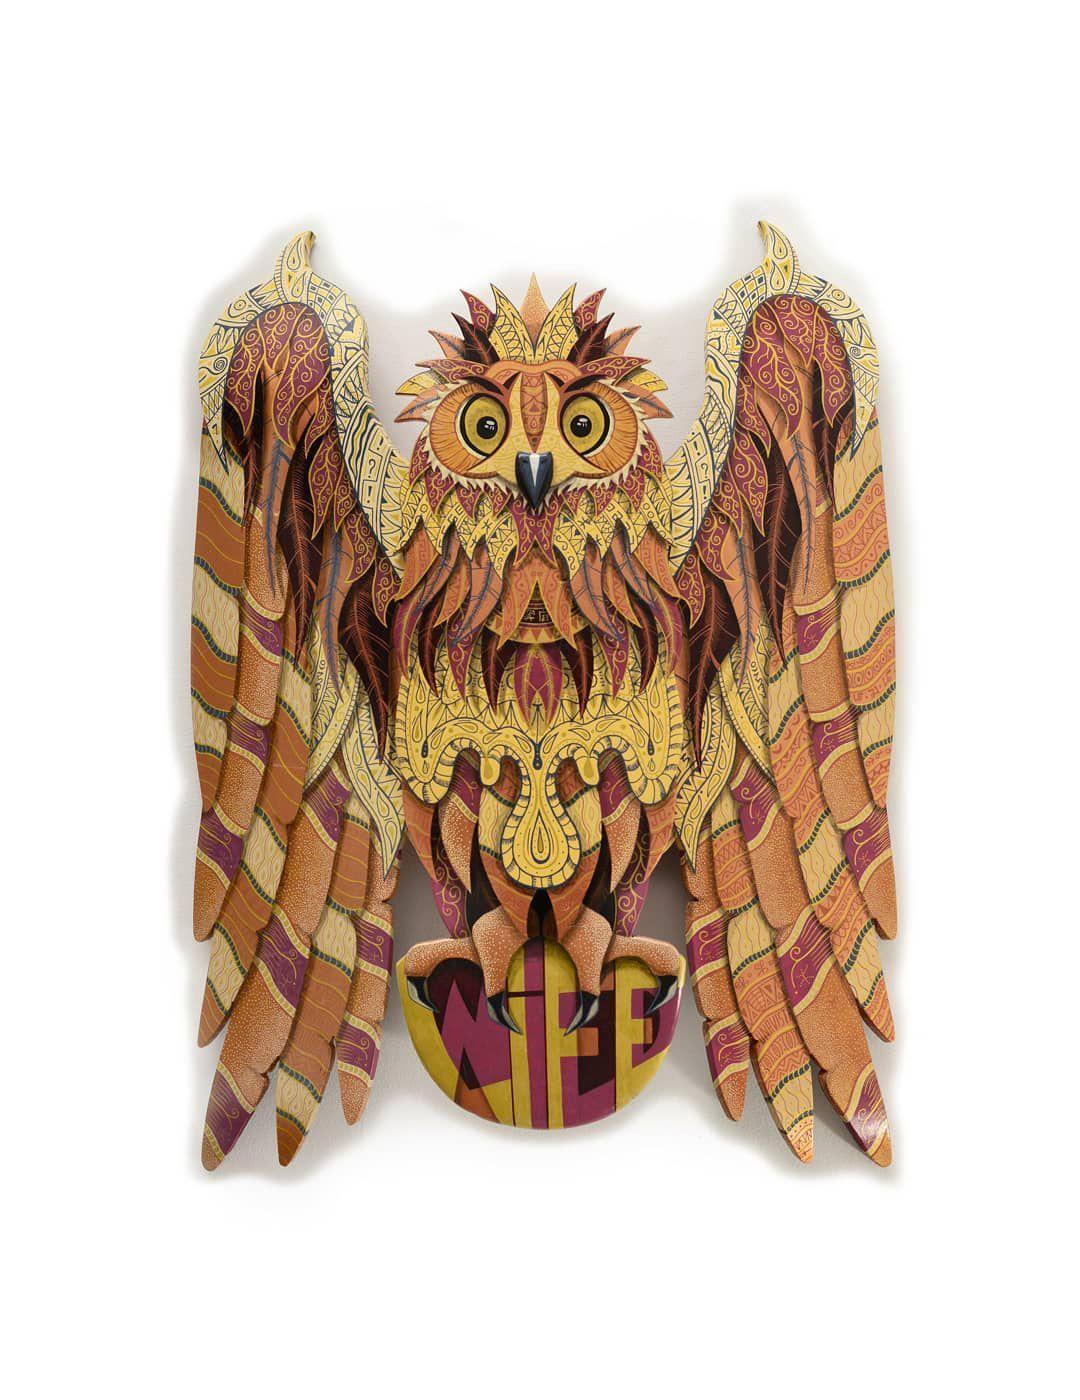 Owl Wild Life Skate Sculpture By Julien Feniau 1